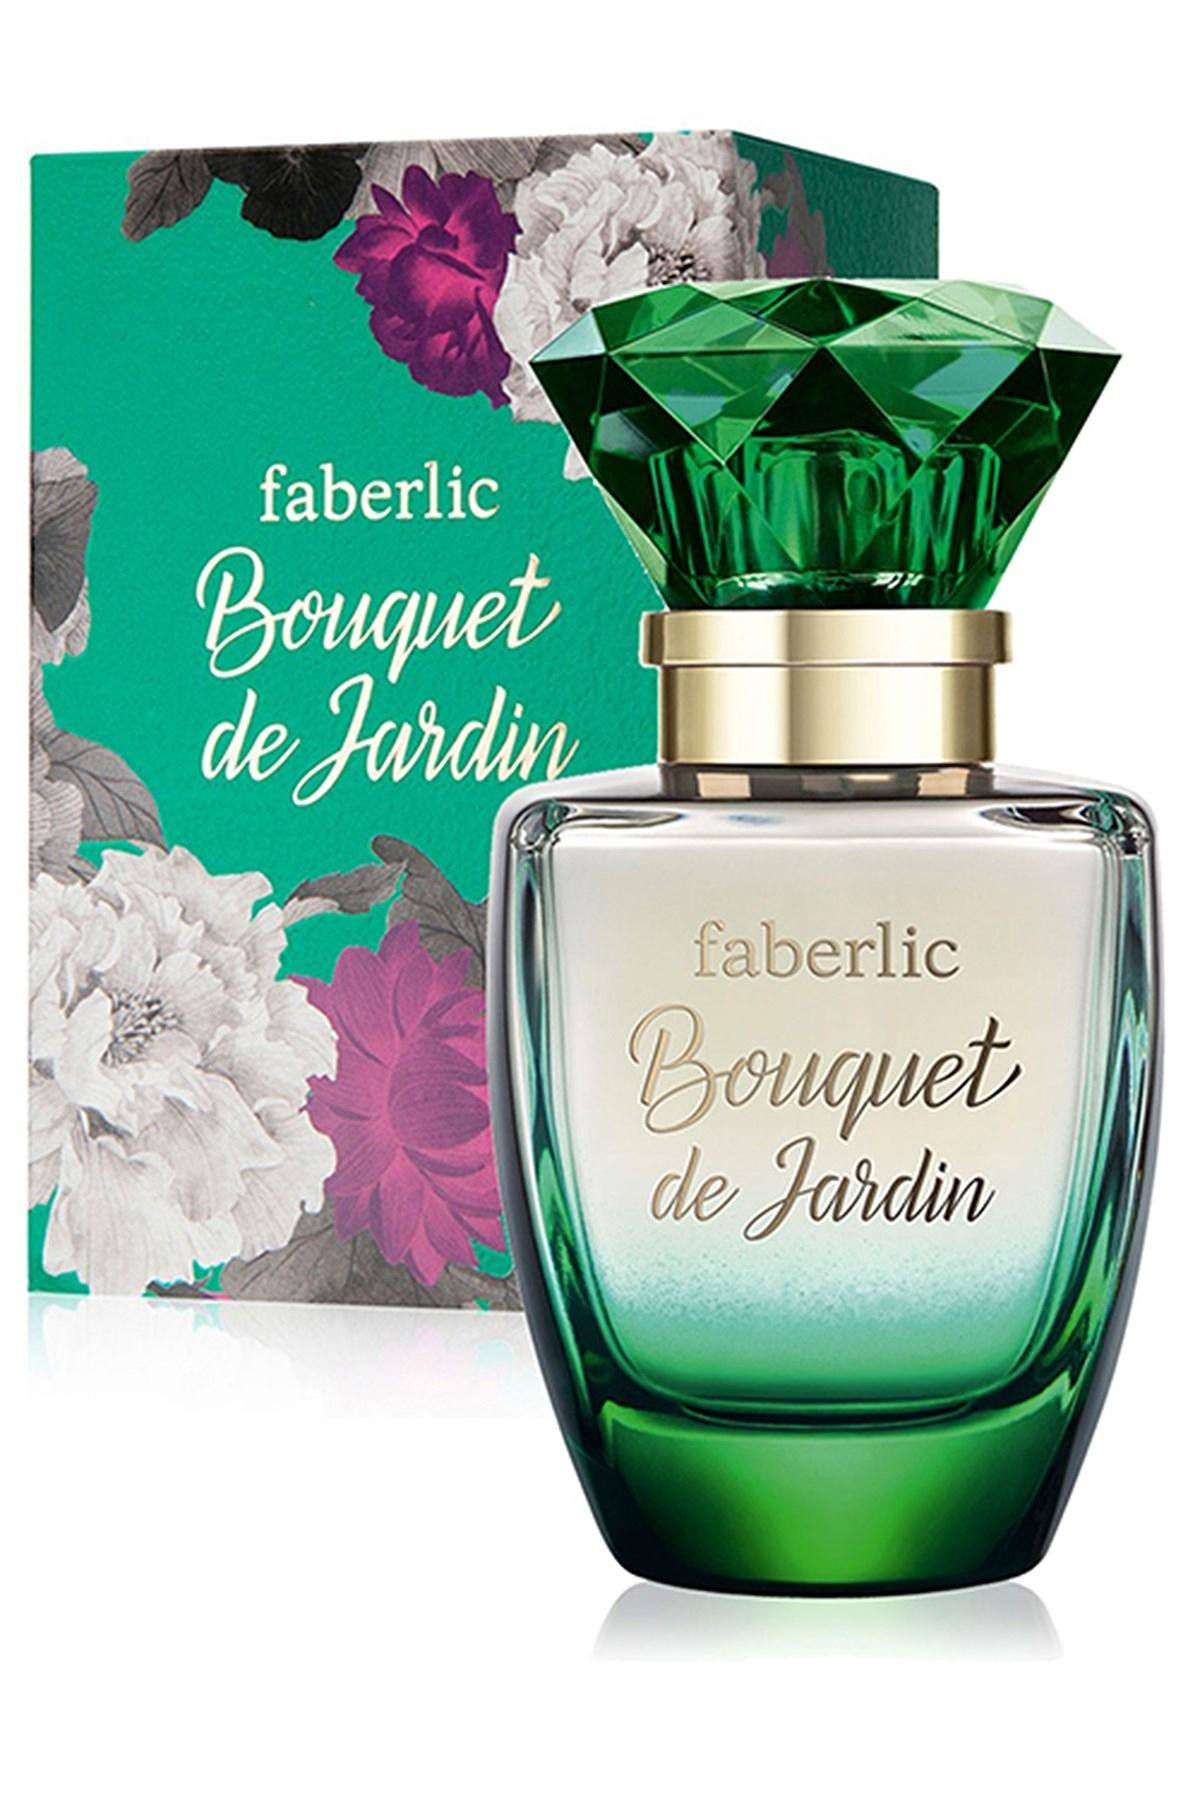 Standart Faberlic Bouquet De Jardin Kadın Parfüm Edp 50 Ml. encequiconcerne Salin De Jardin